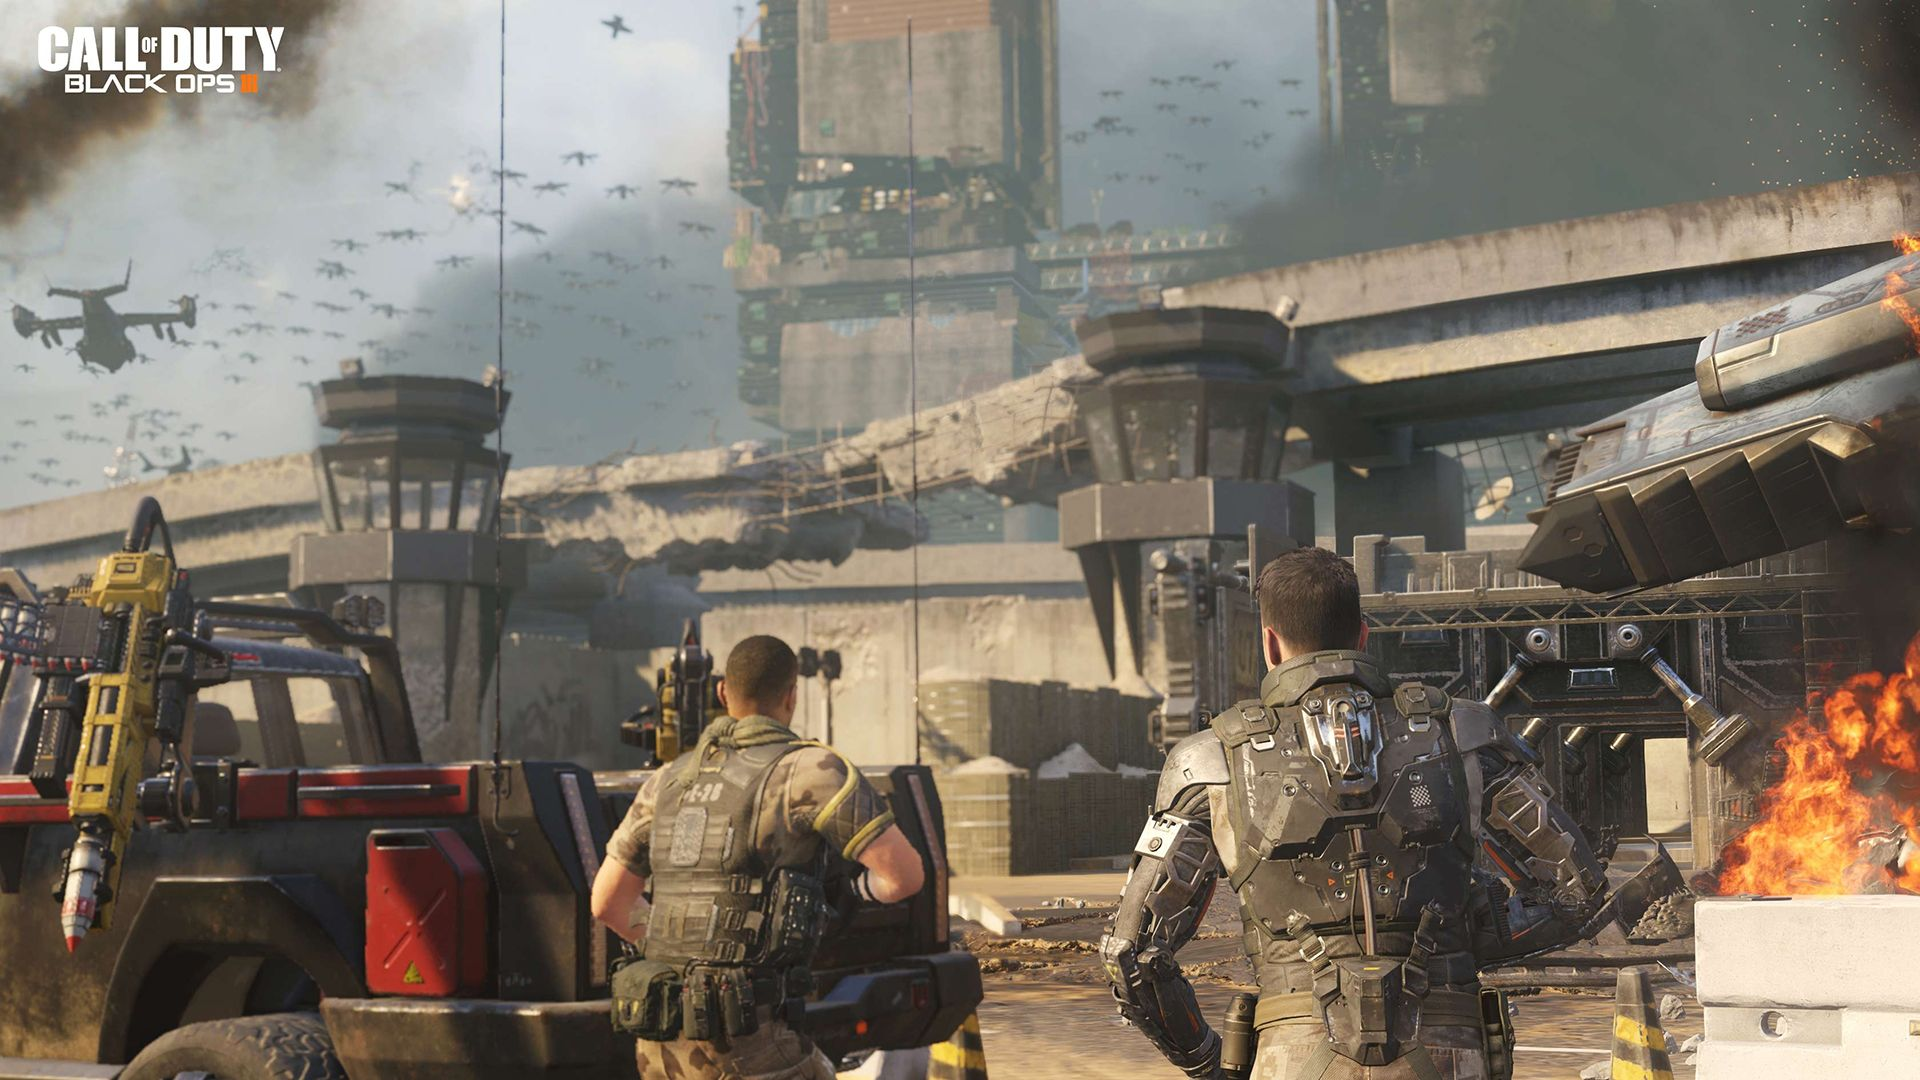 Call of Duty: Black Ops III (PS3) - 5